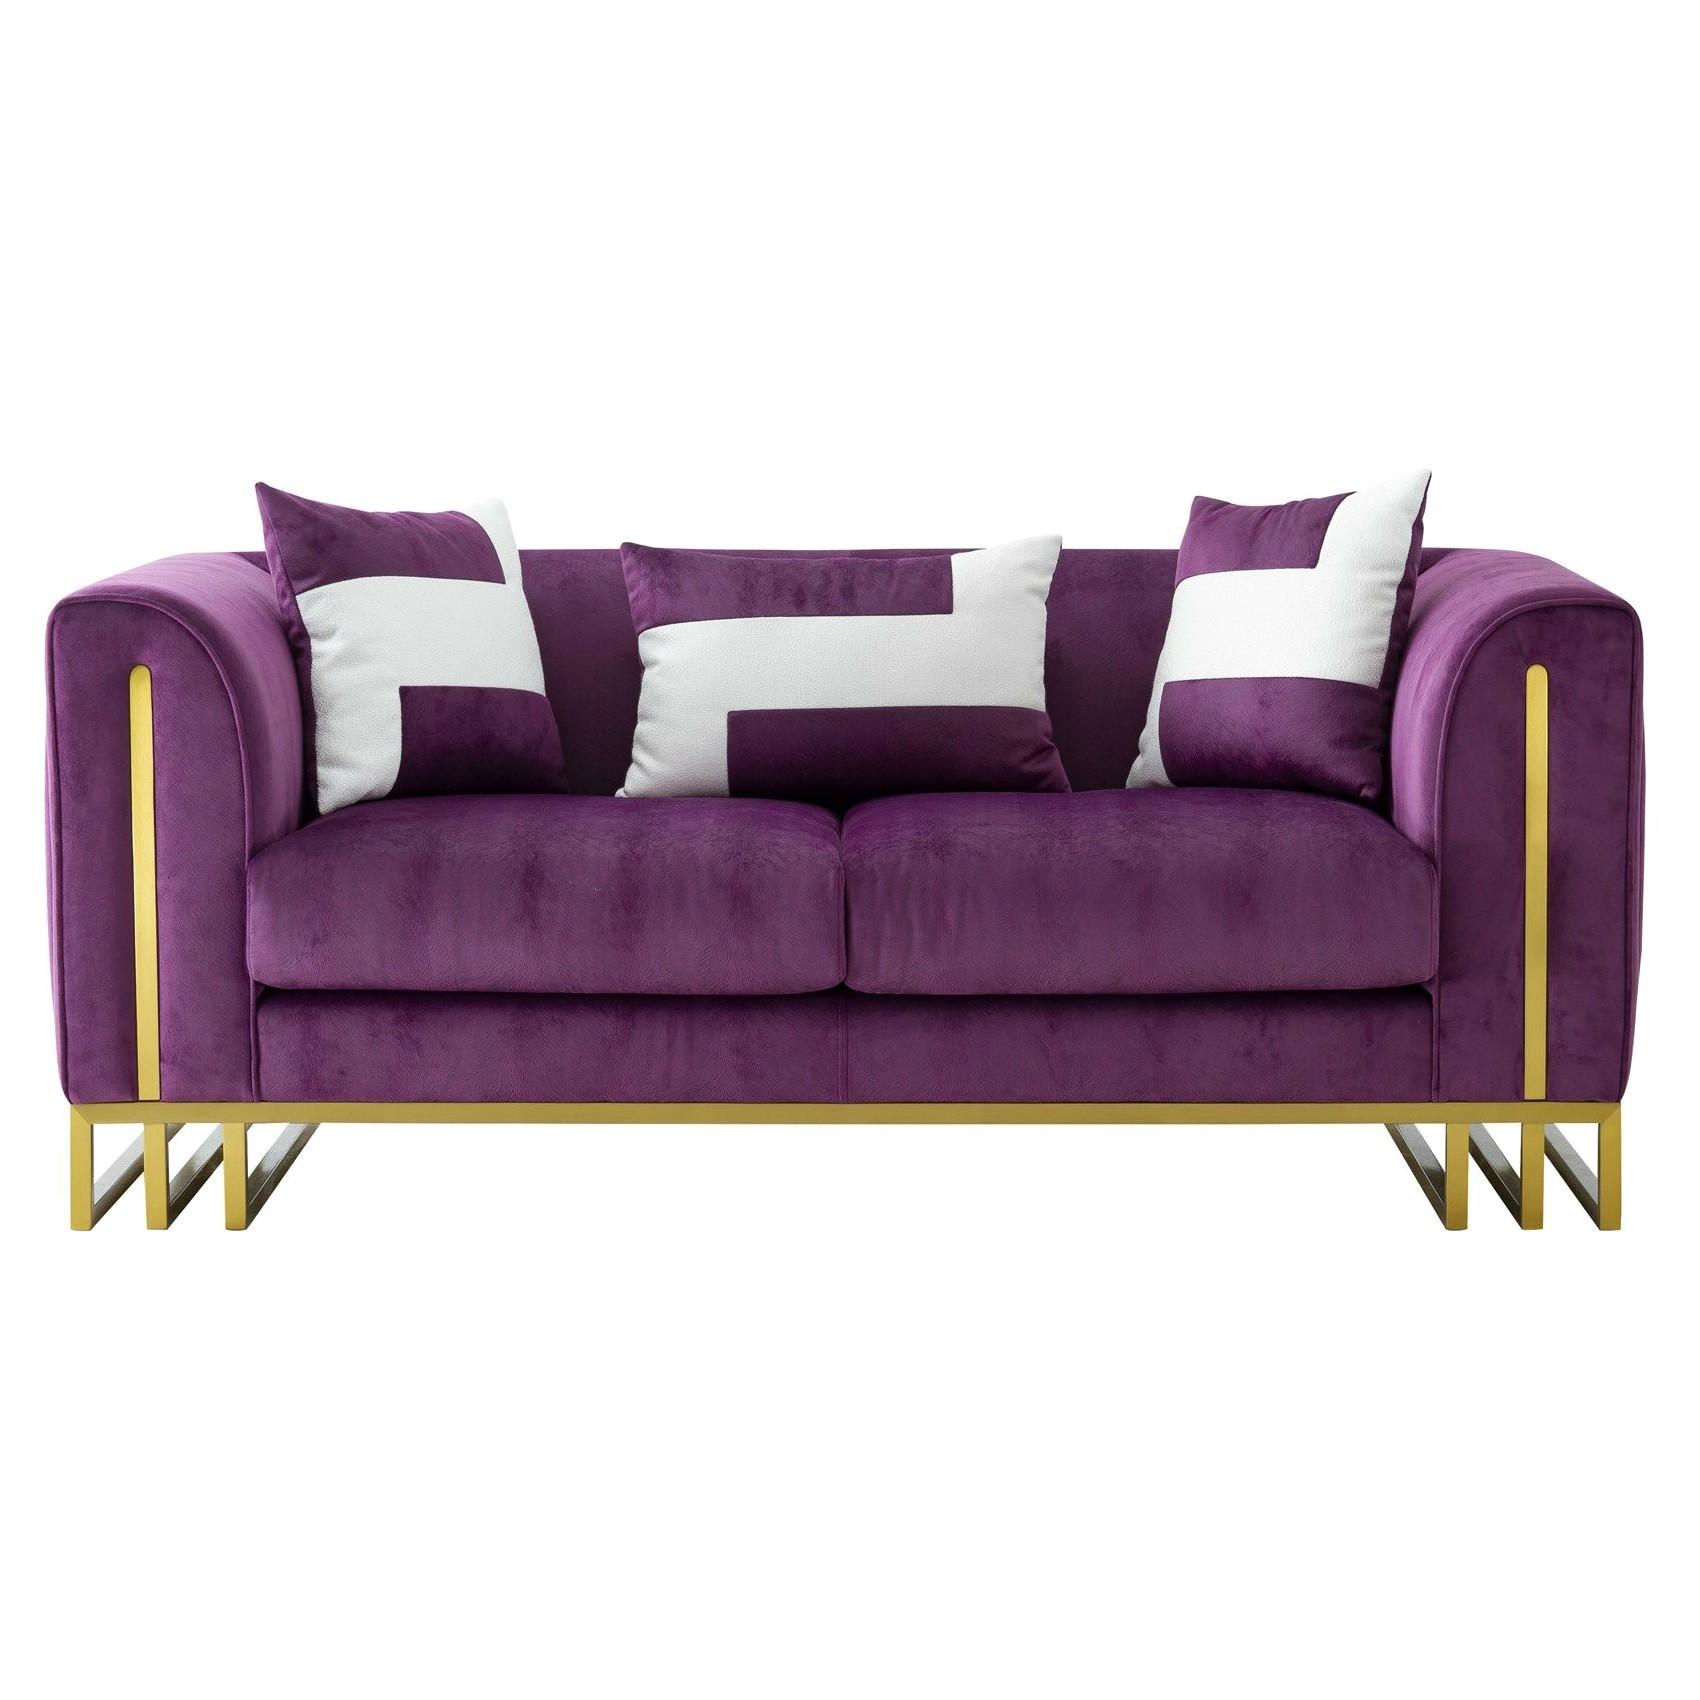 Lonetto Fabric Sofa, 2 Seater